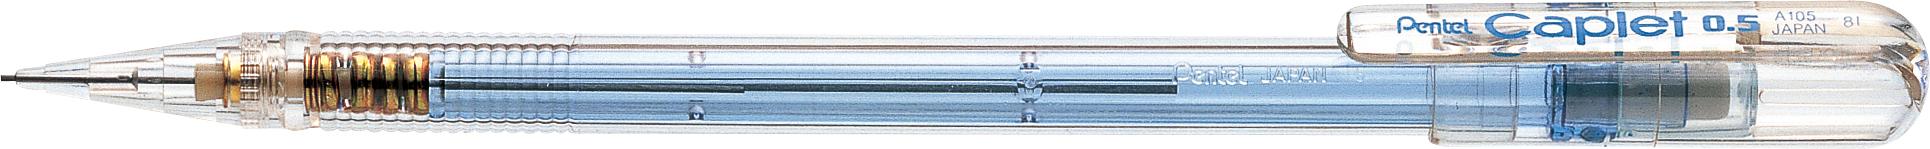 Pentel Caplet M.Pencil (Pack of 20Pcs)